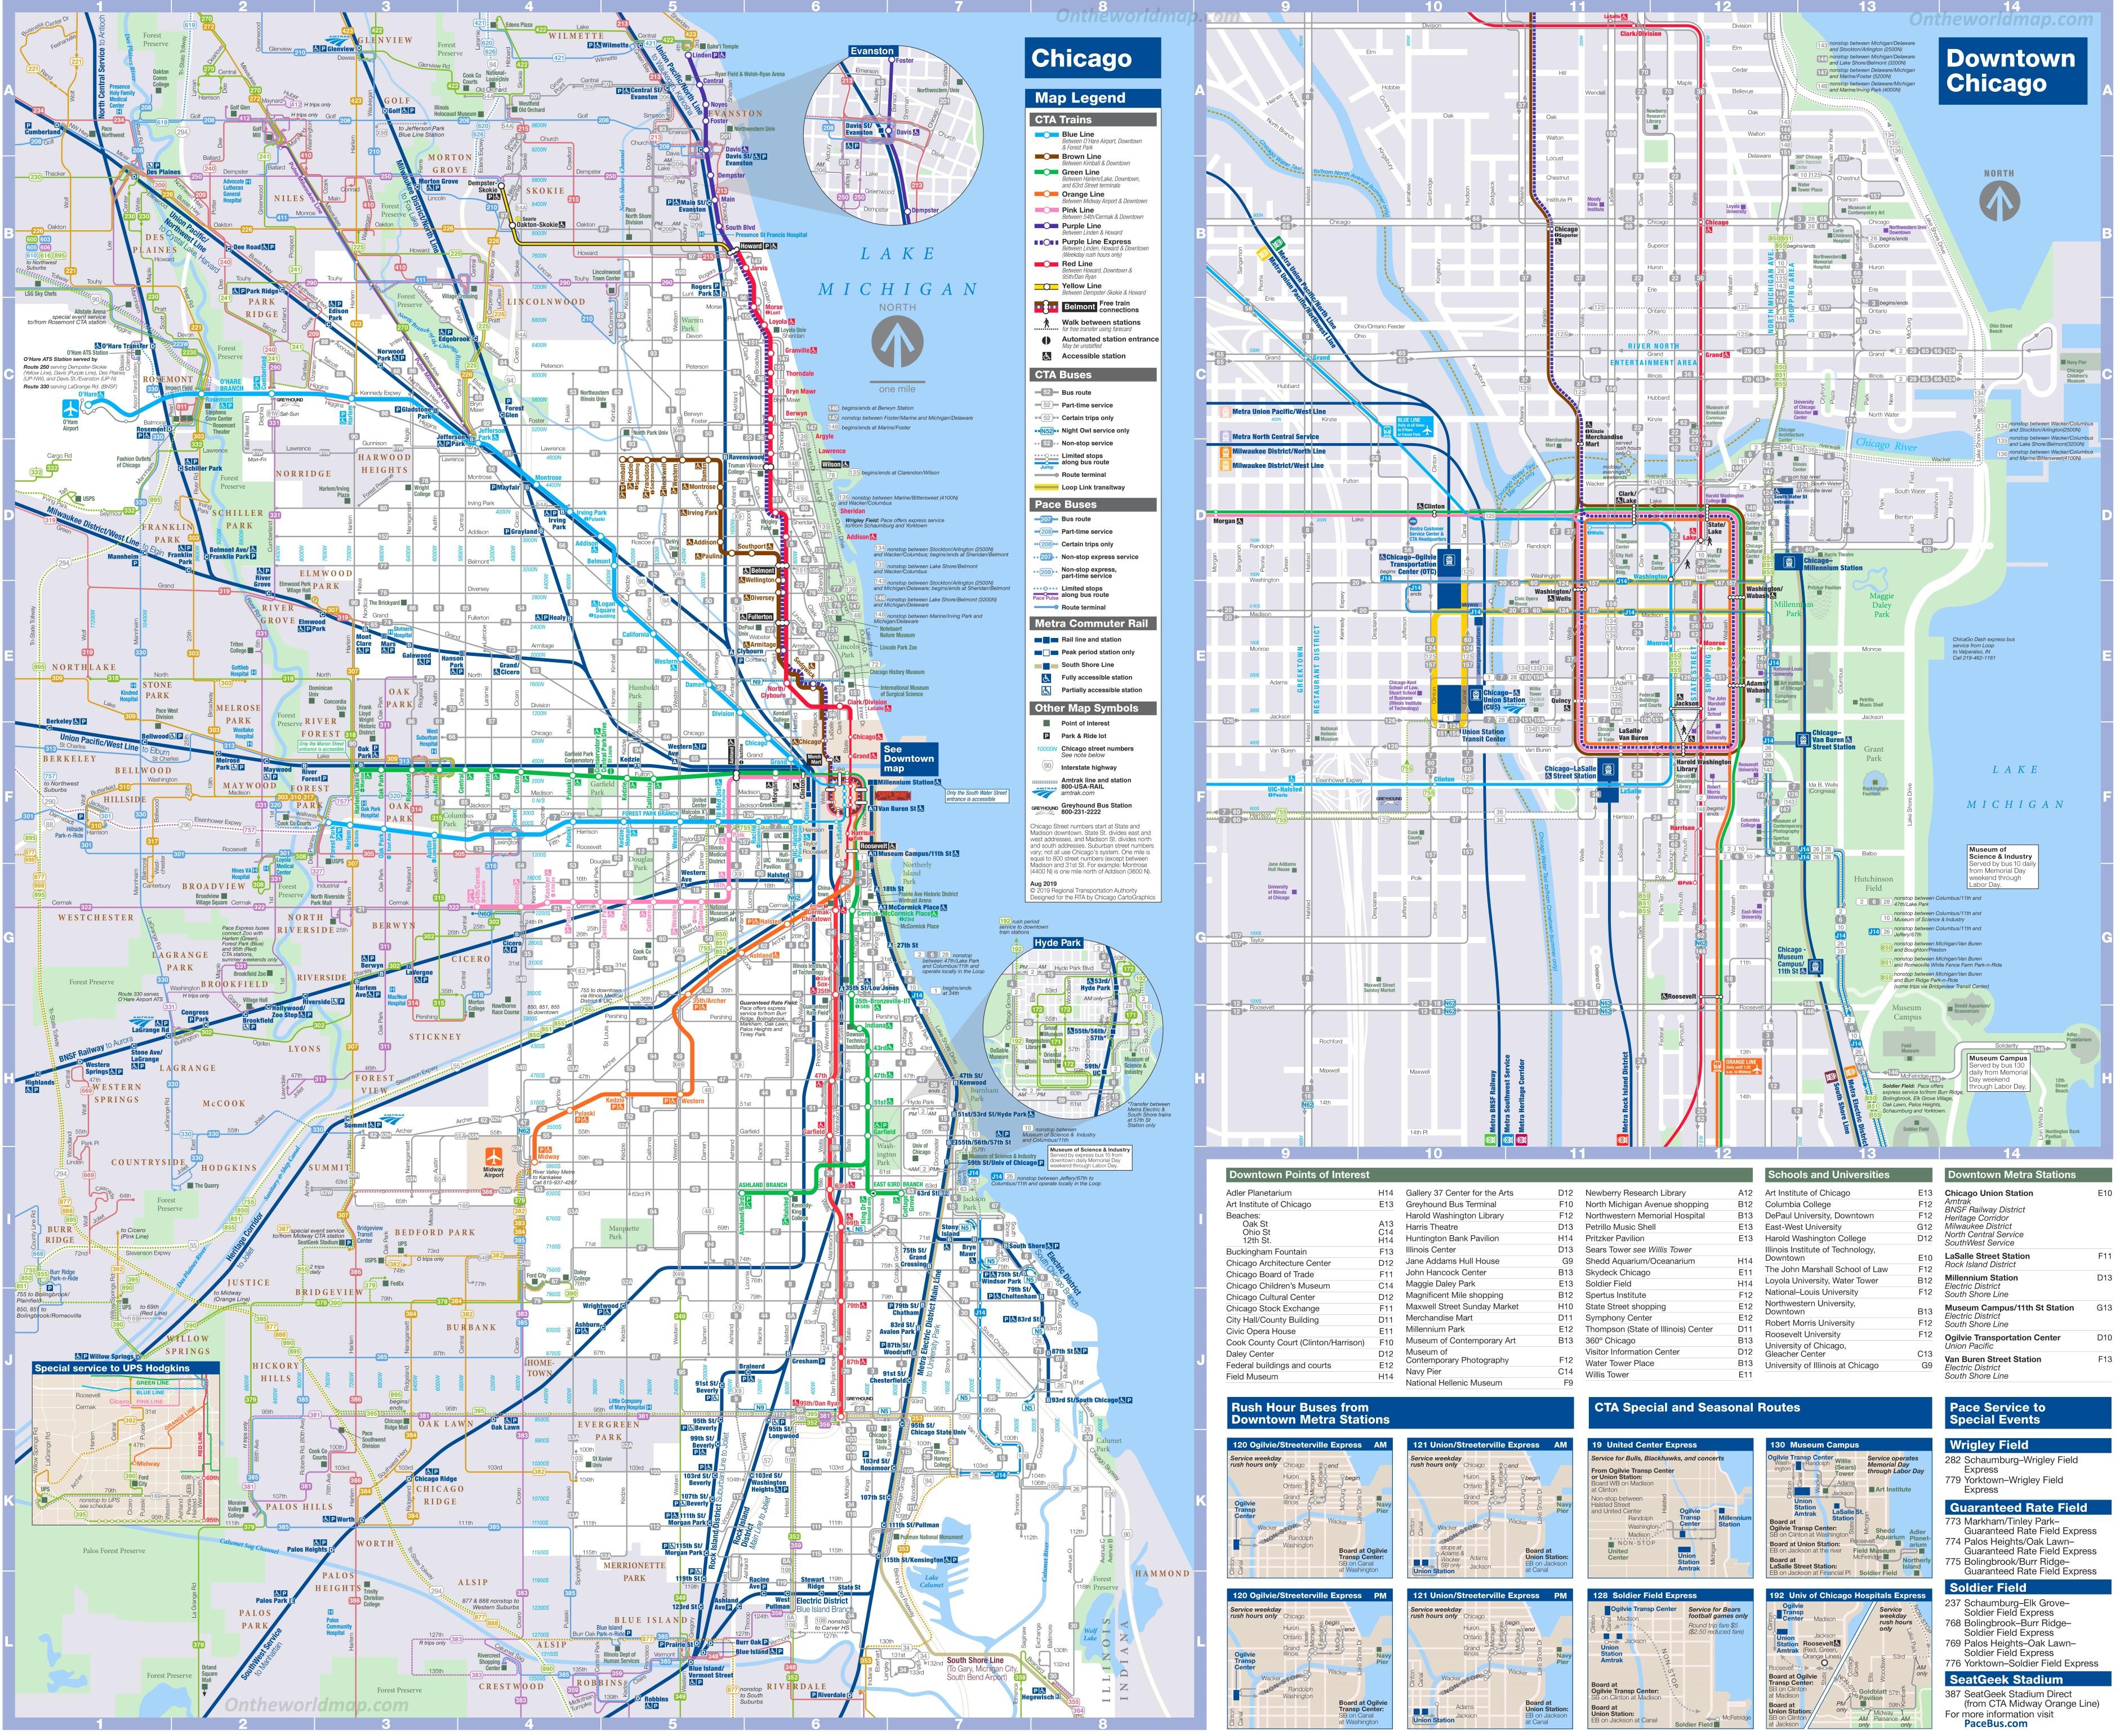 Chicago transport map